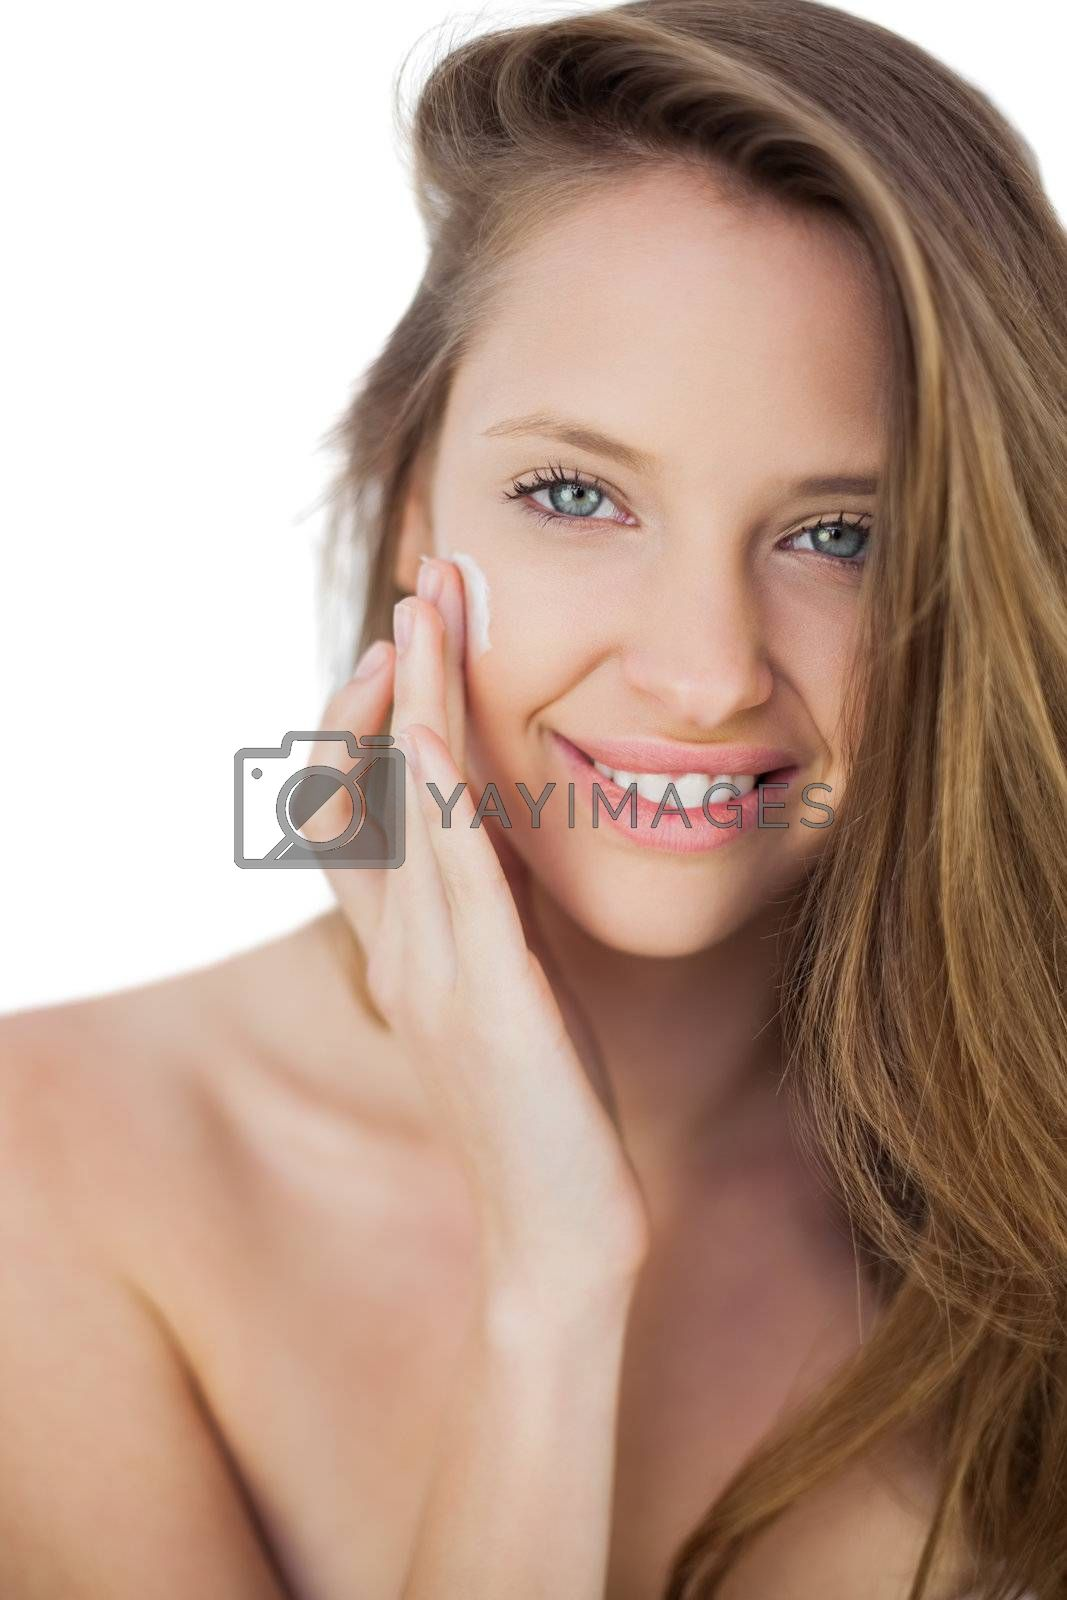 Smiling brunette model rubbing her cheek with cream by Wavebreakmedia